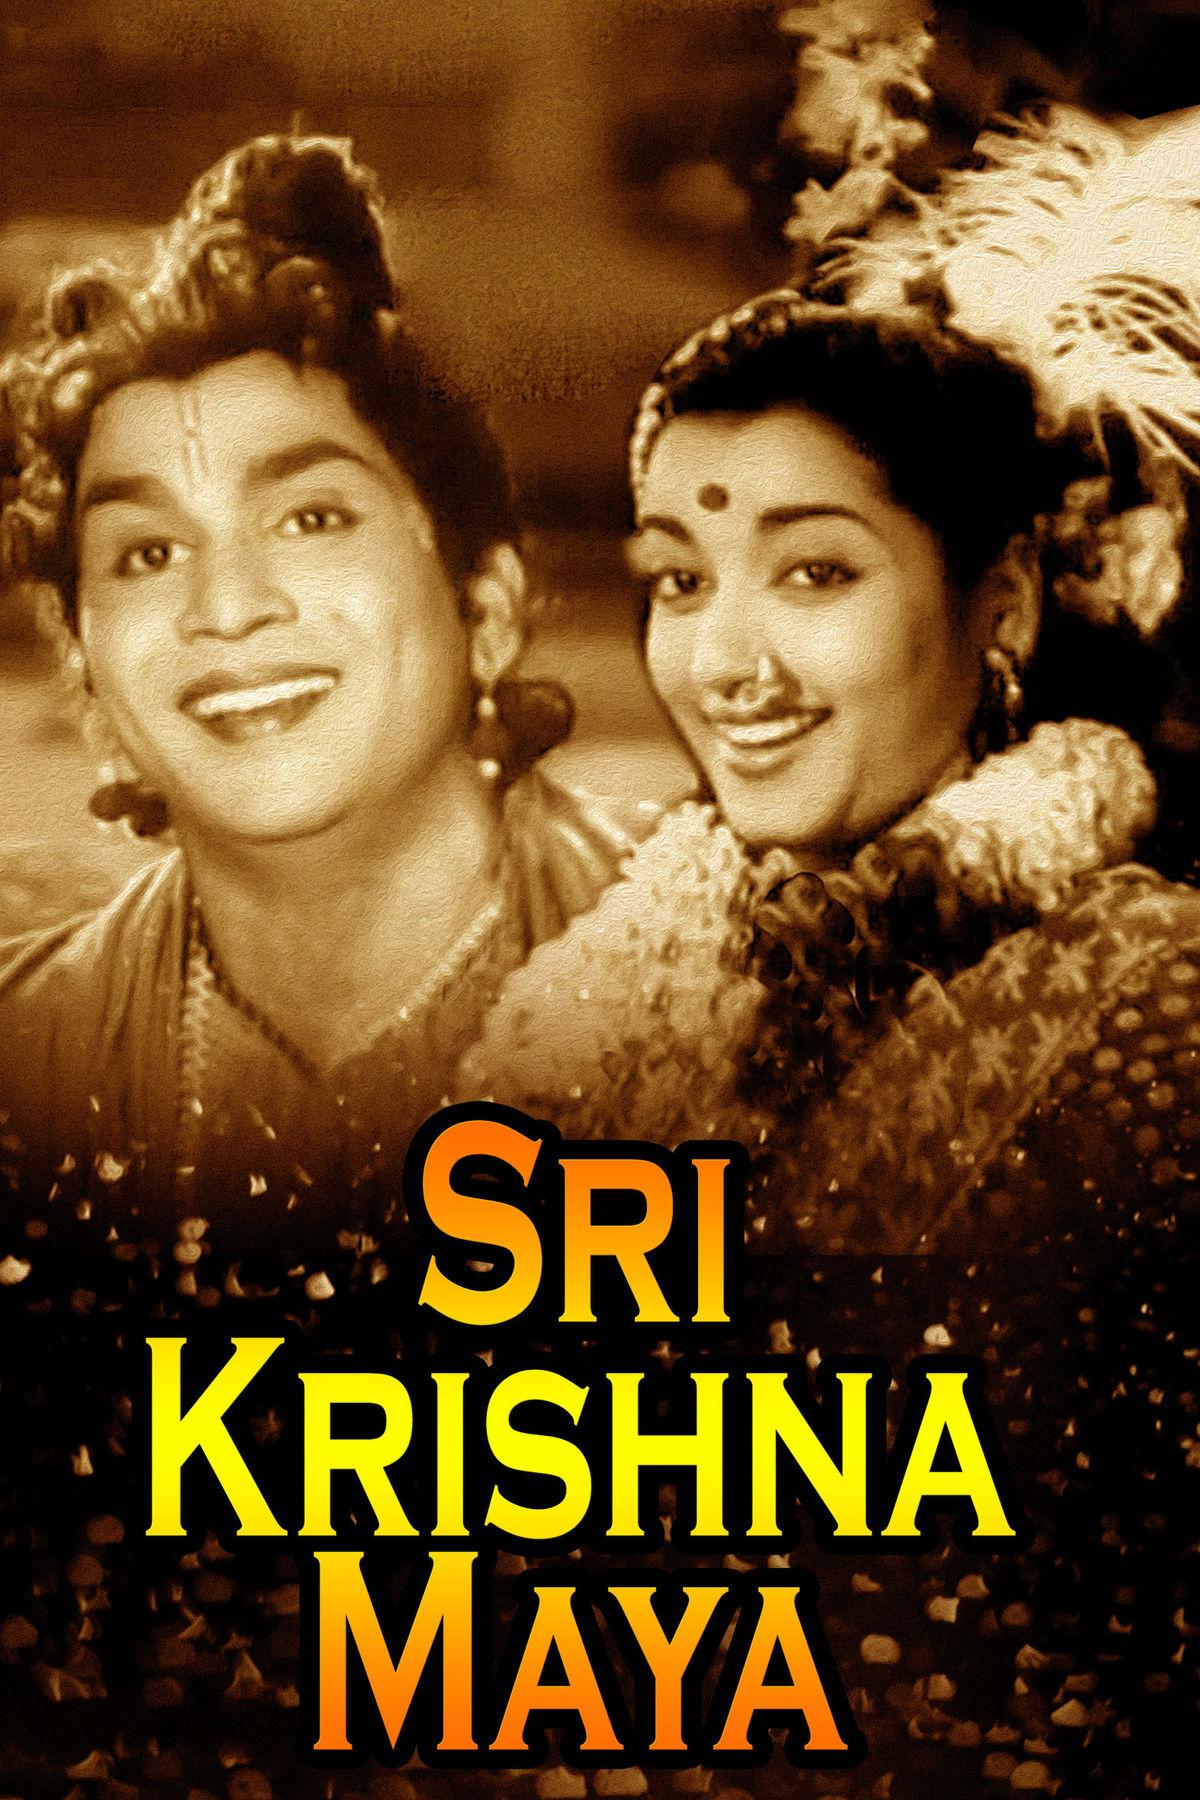 Sri Krishna Maya